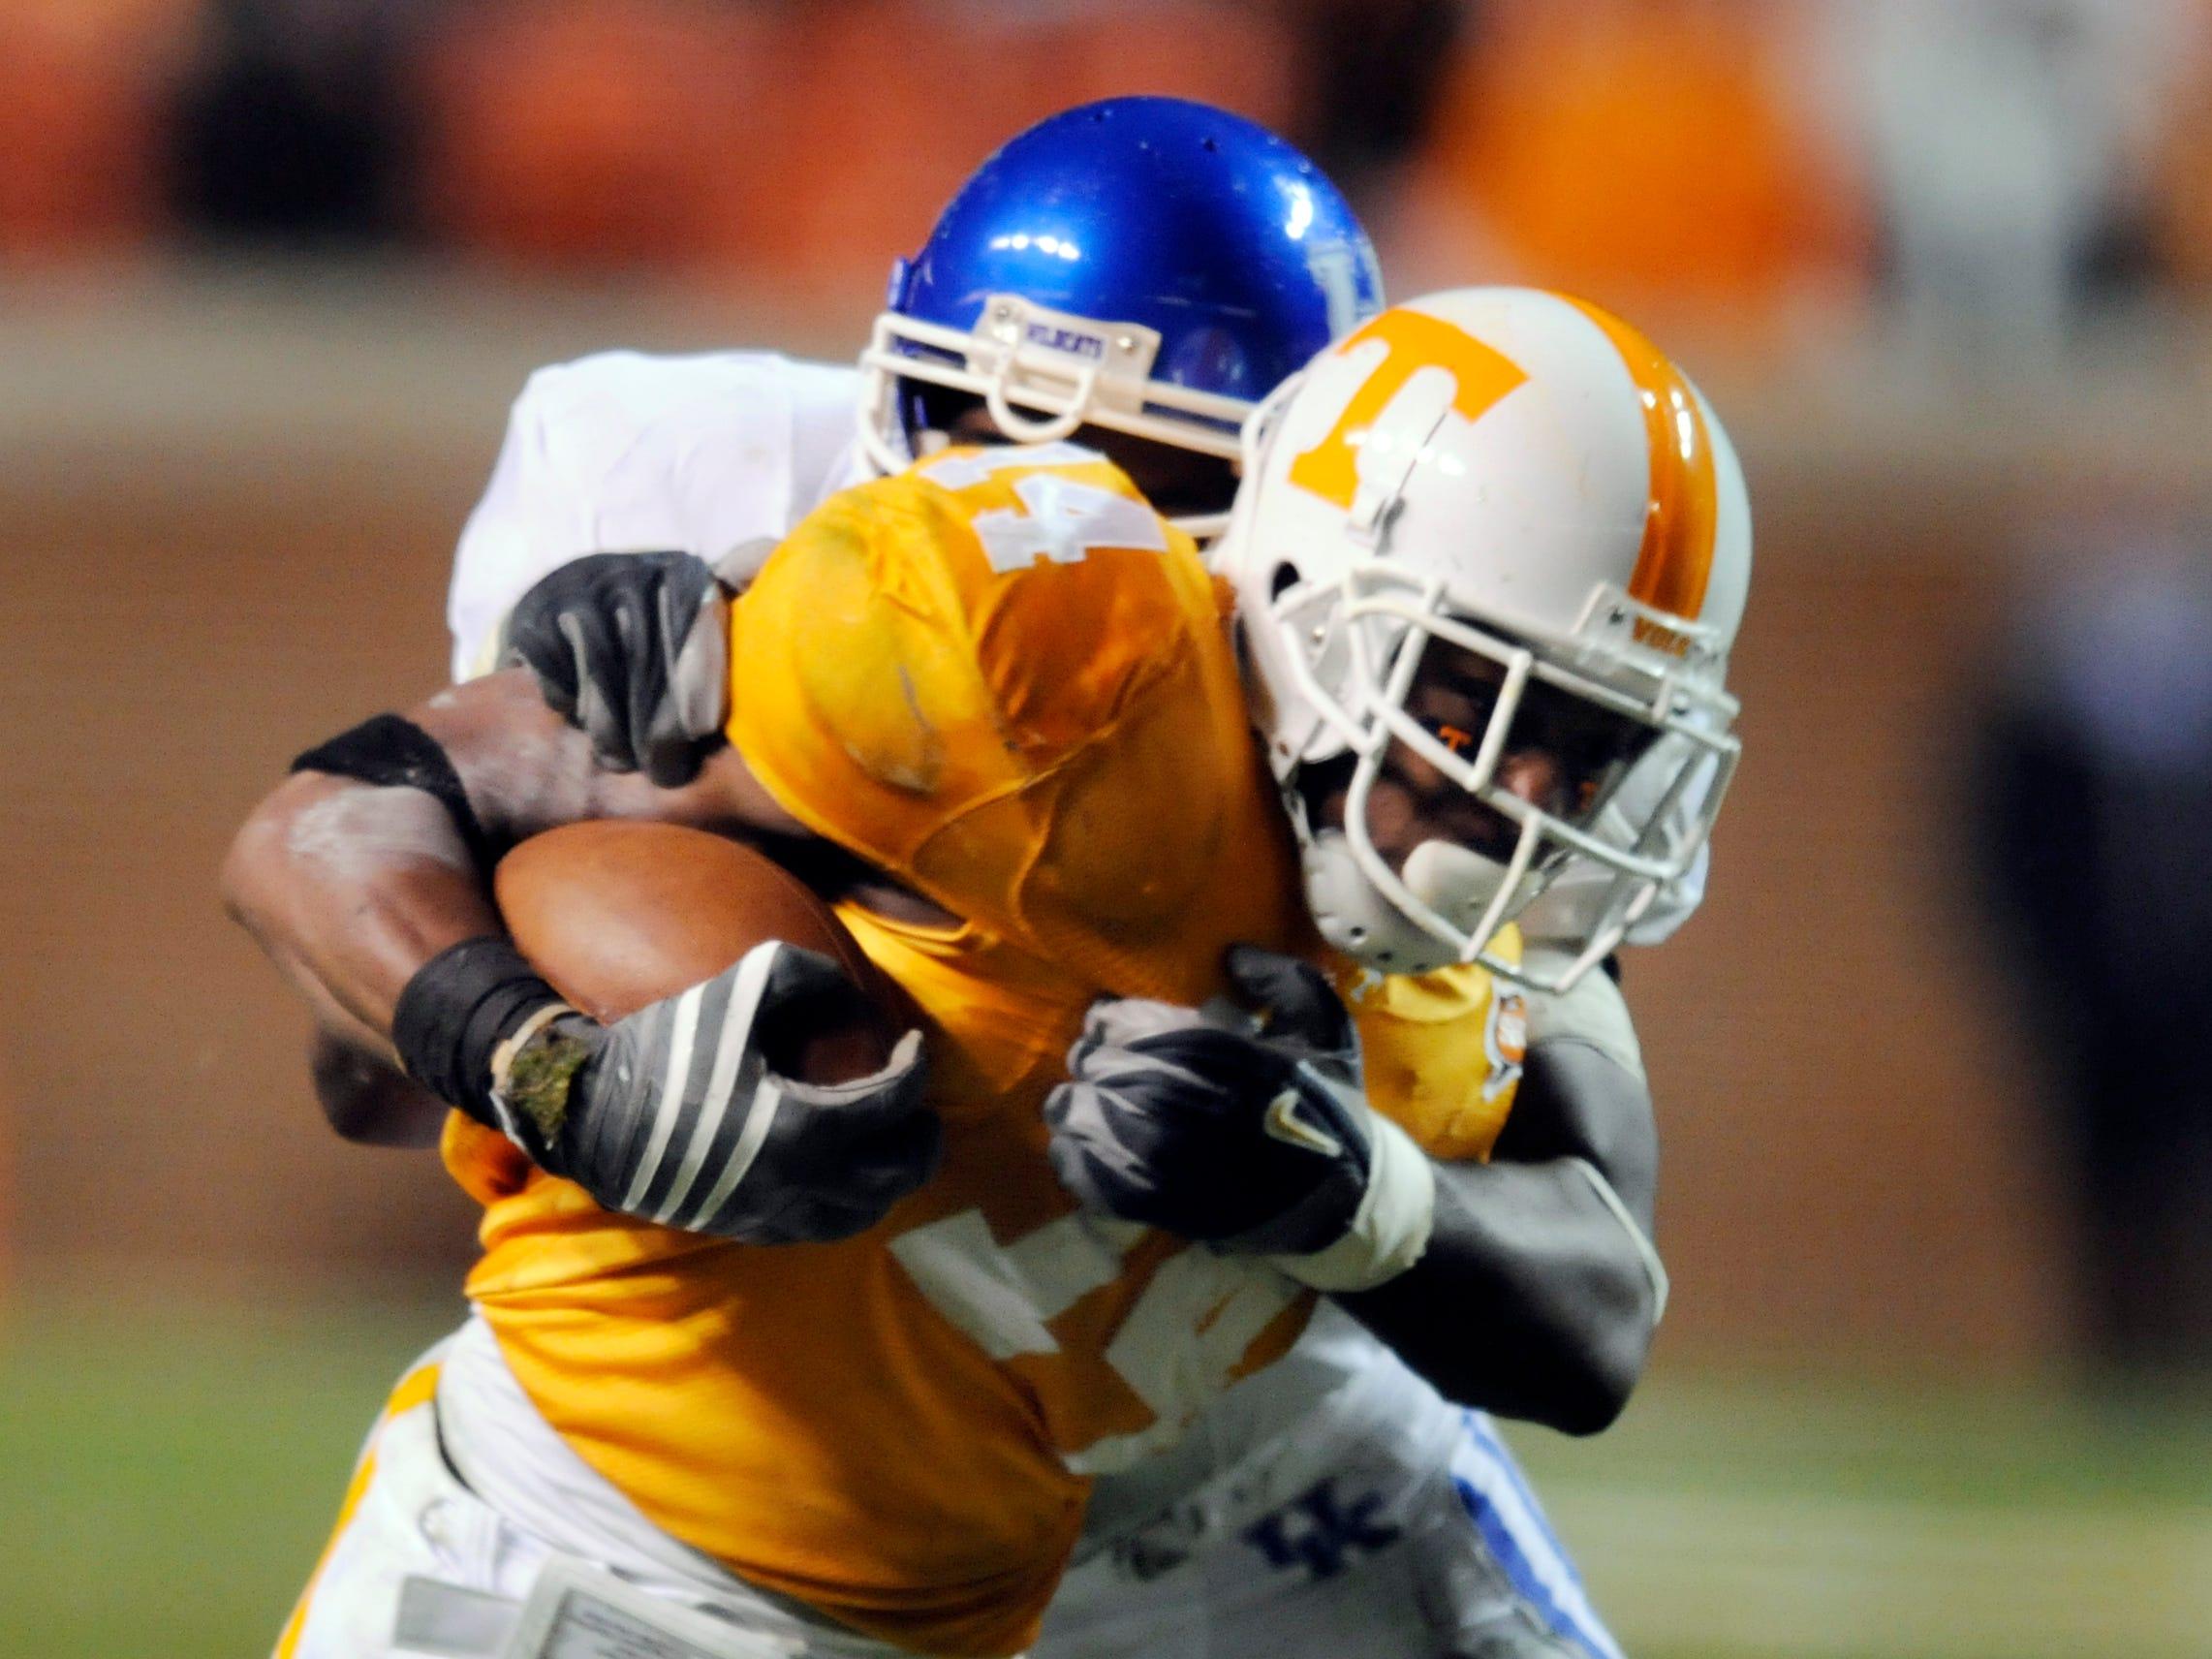 Tennessee's Eric Berry (14) slips away from a Kentucky defender Saturday night in Neyland Stadium. Saturday, November 29, 2008